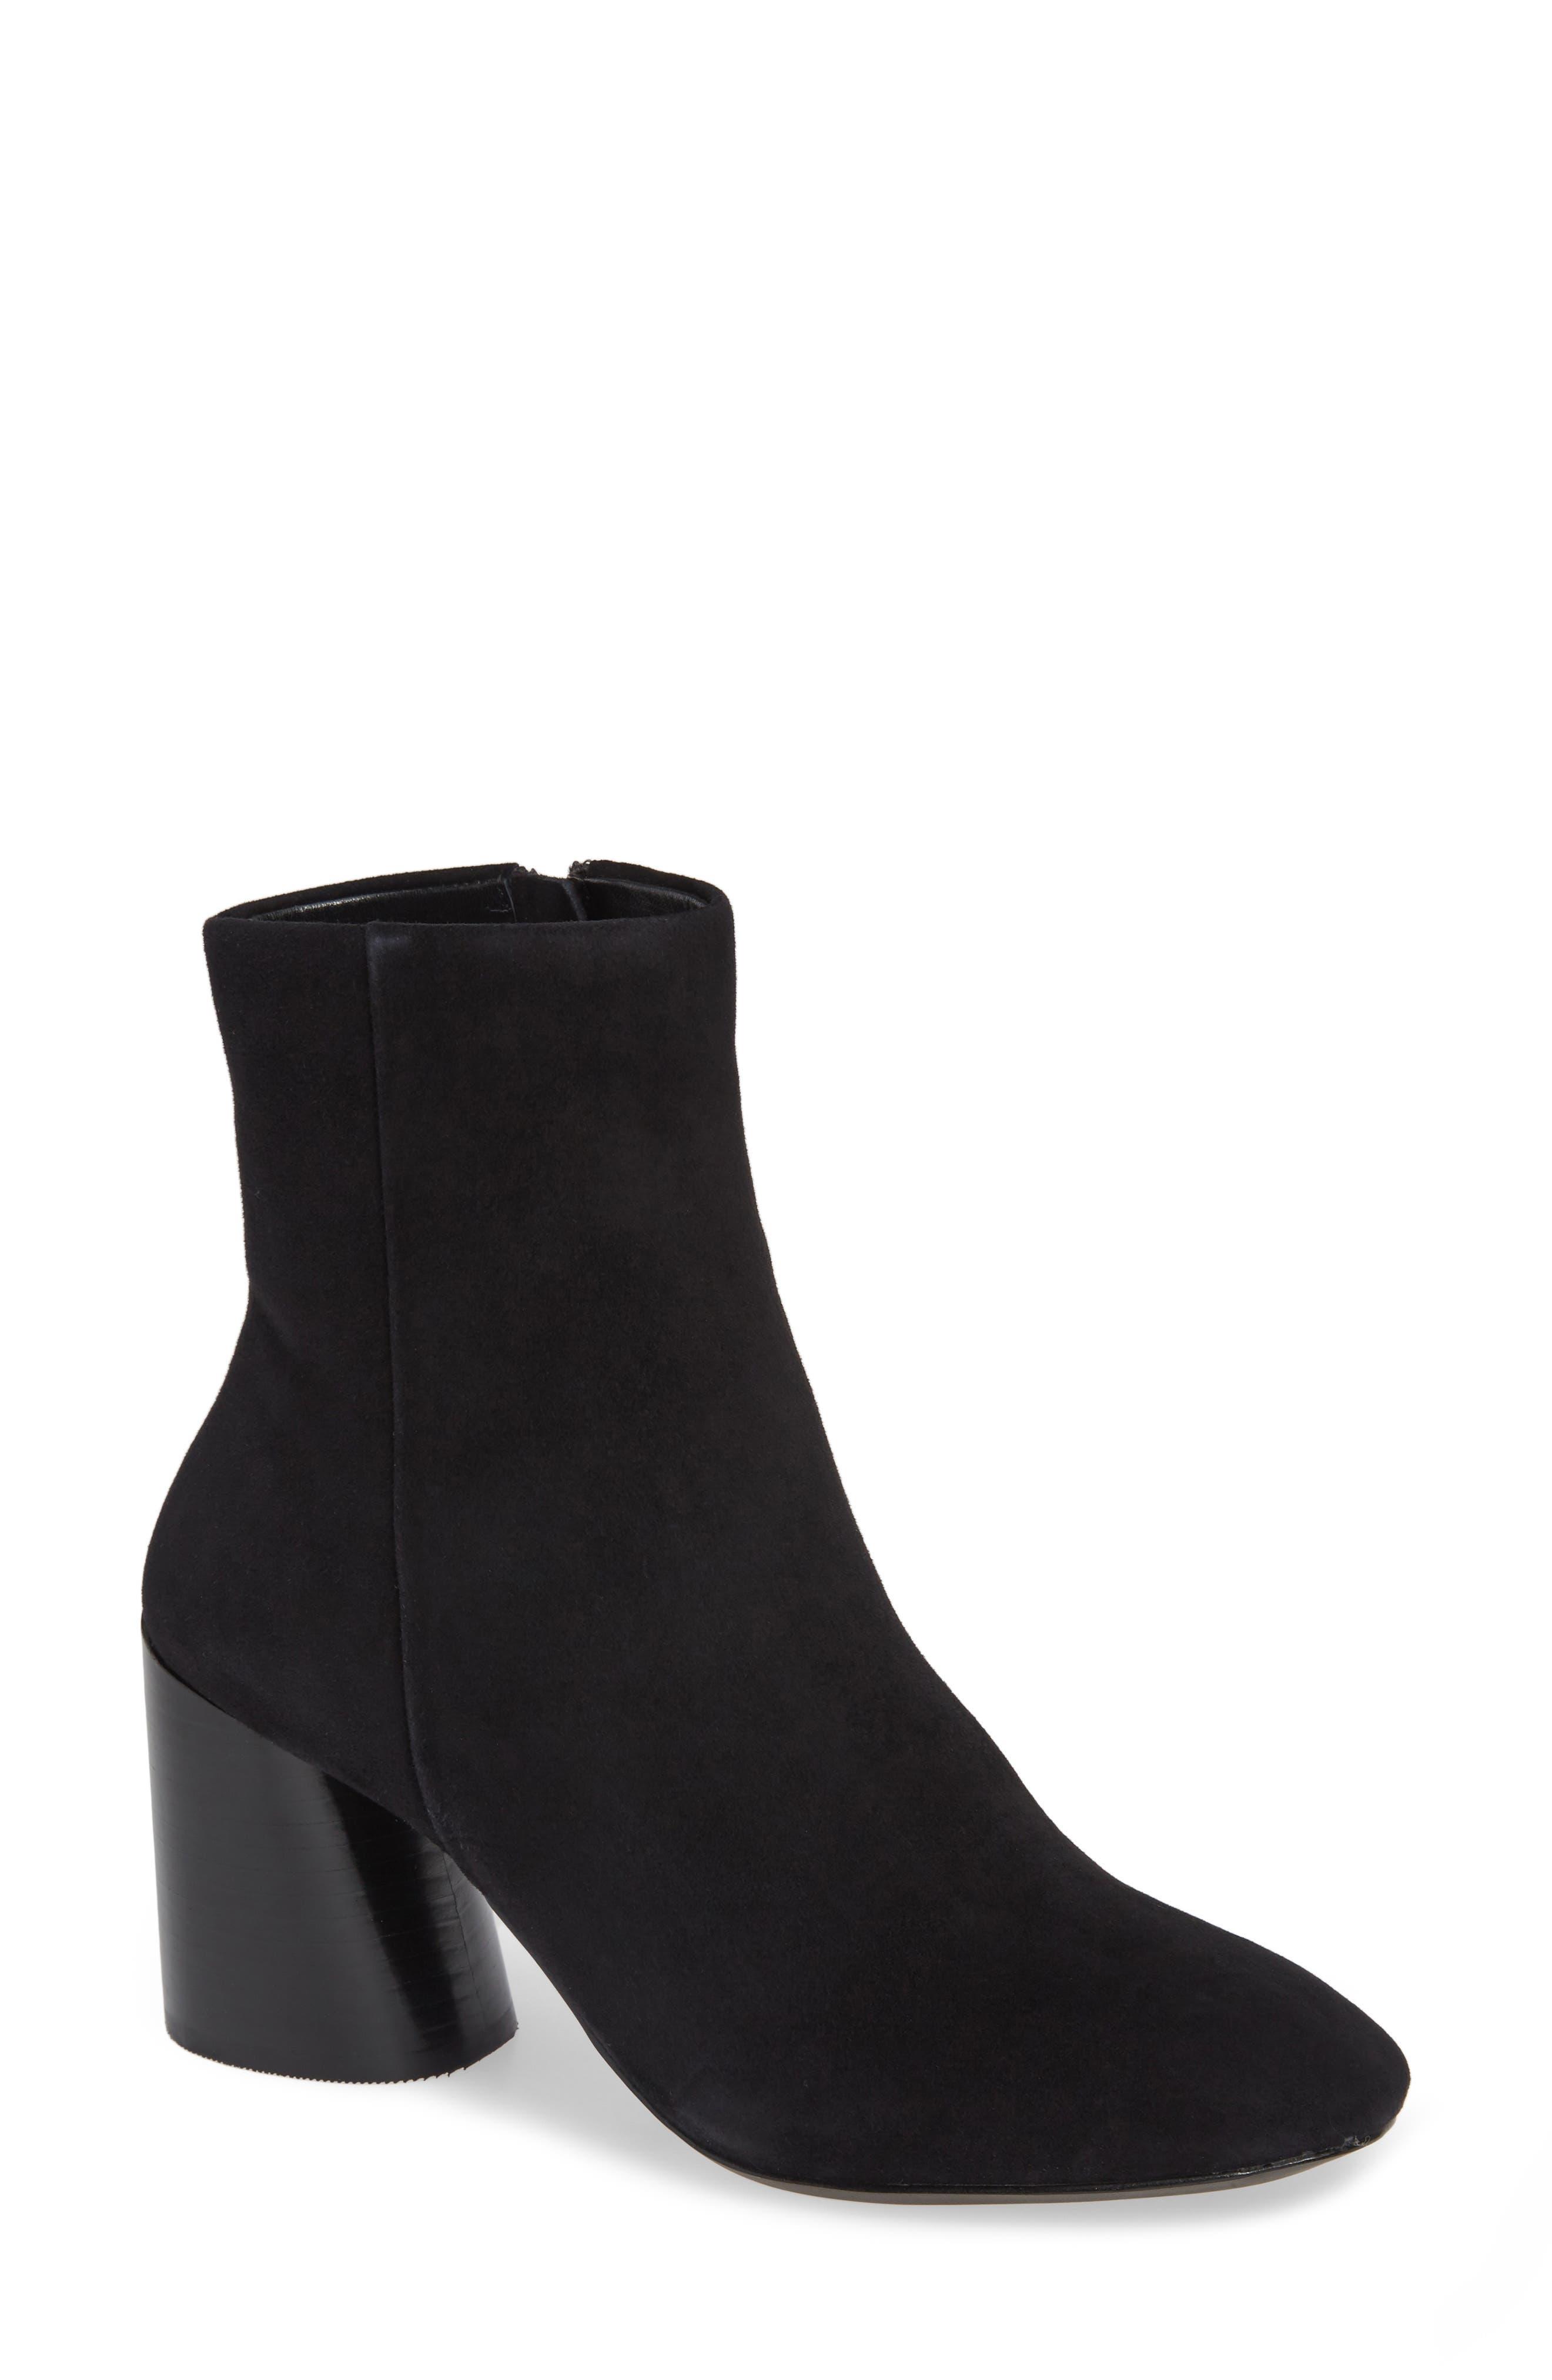 Linea Paolo Savvy Block Heel Bootie, Black